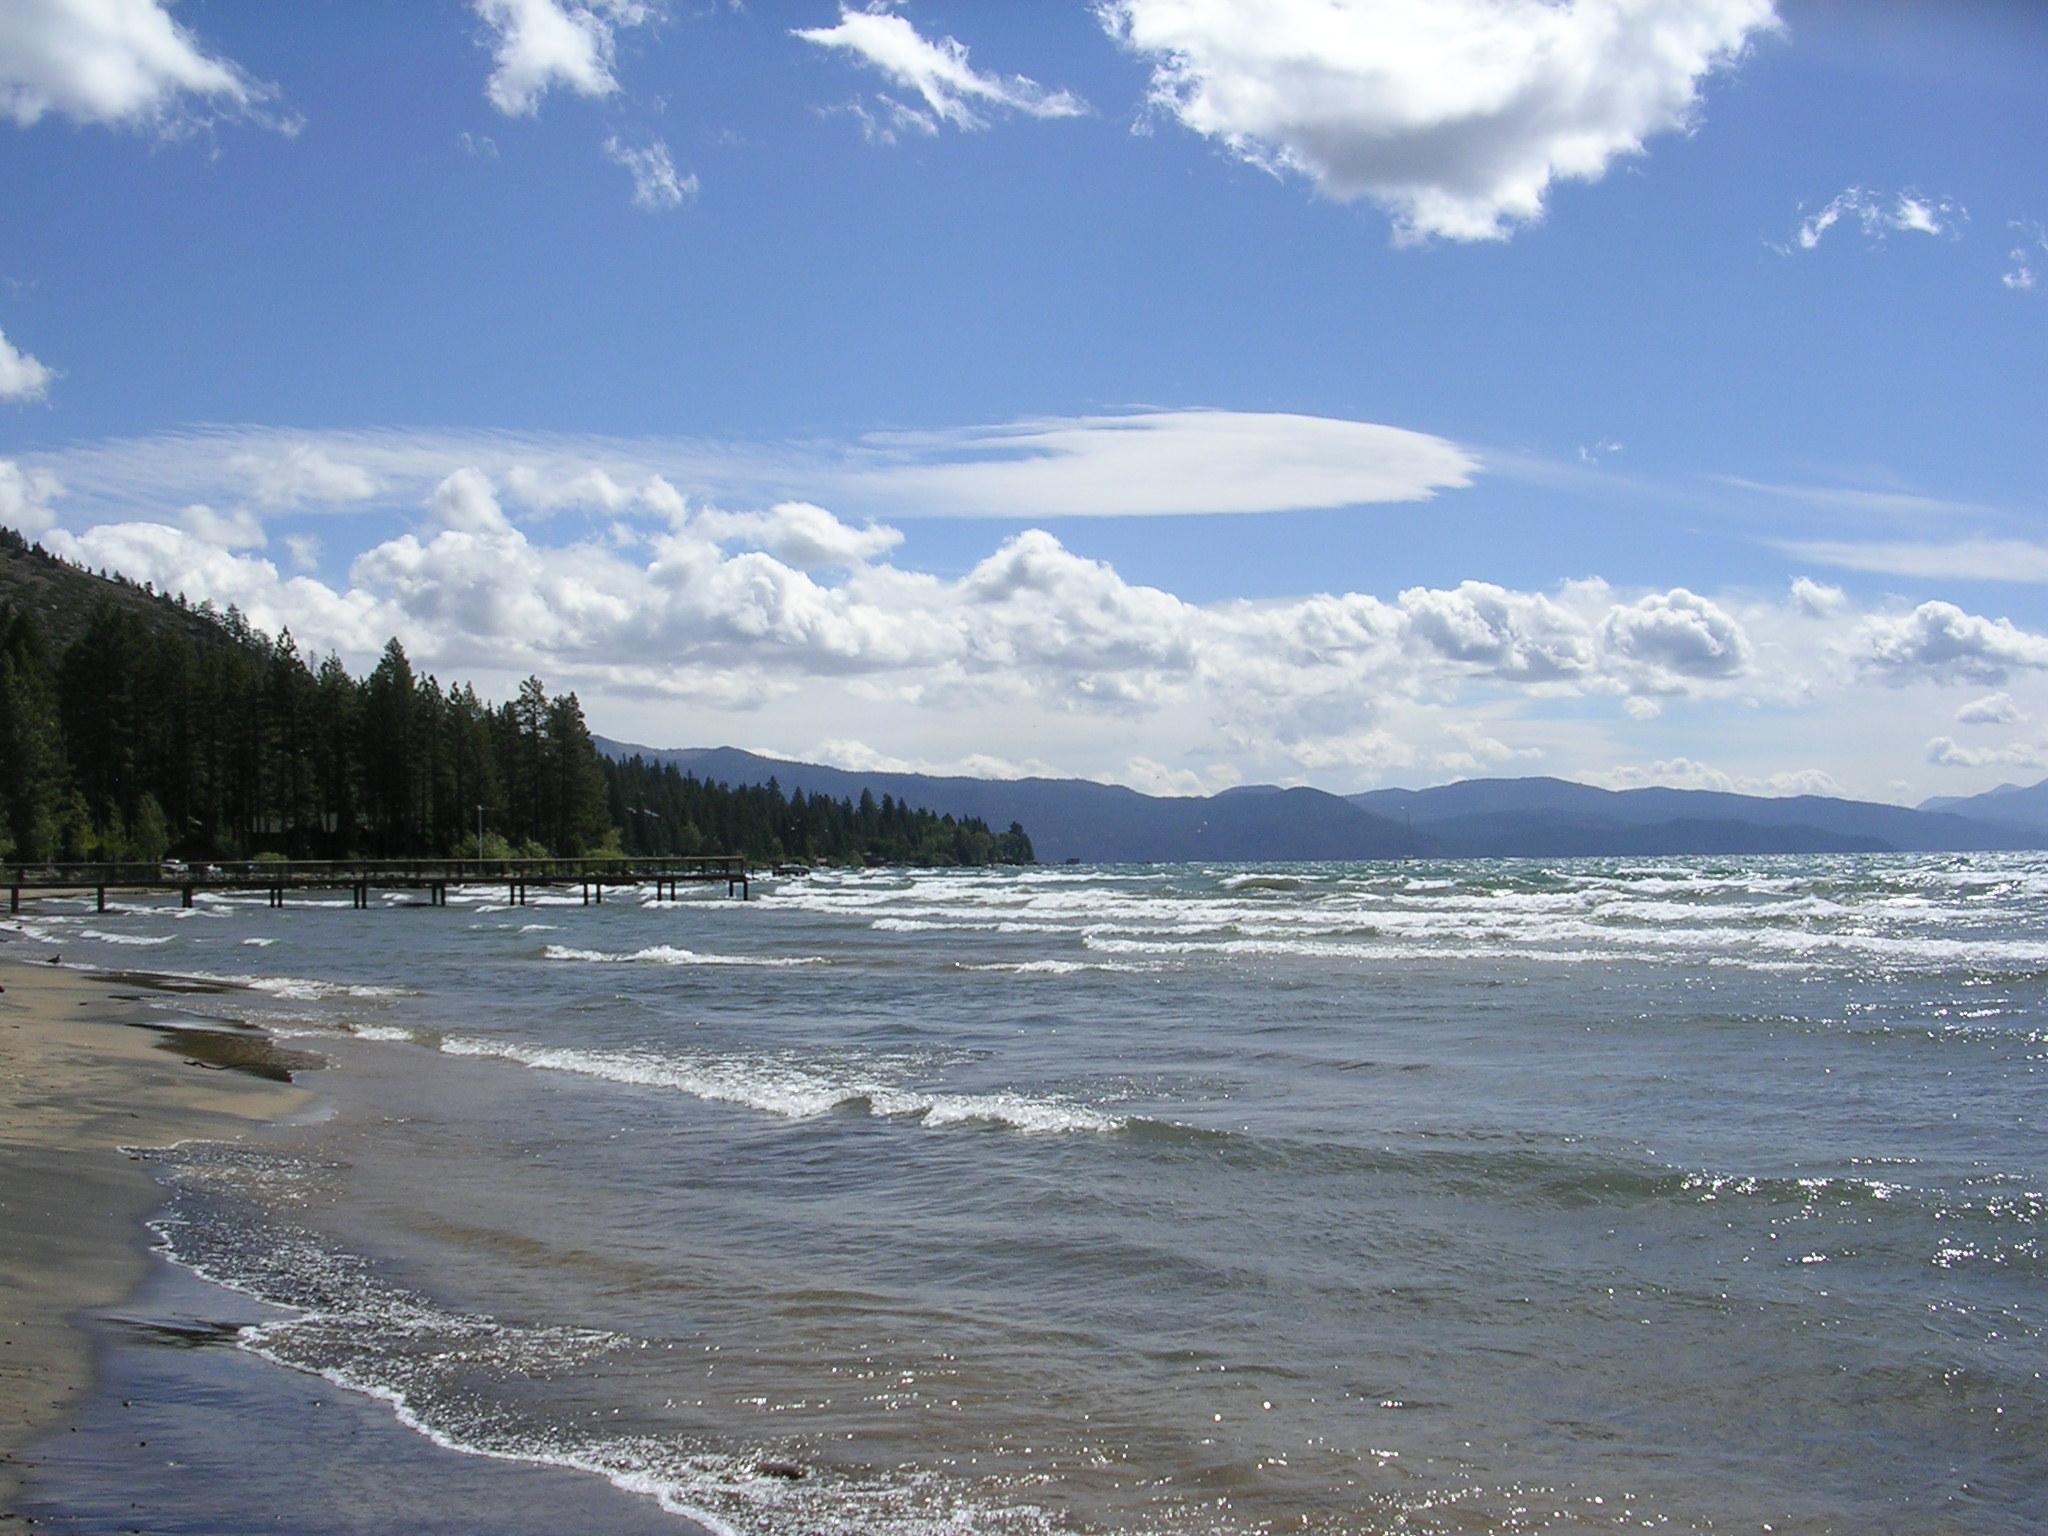 Kings Beach State Recreation Area Image 1